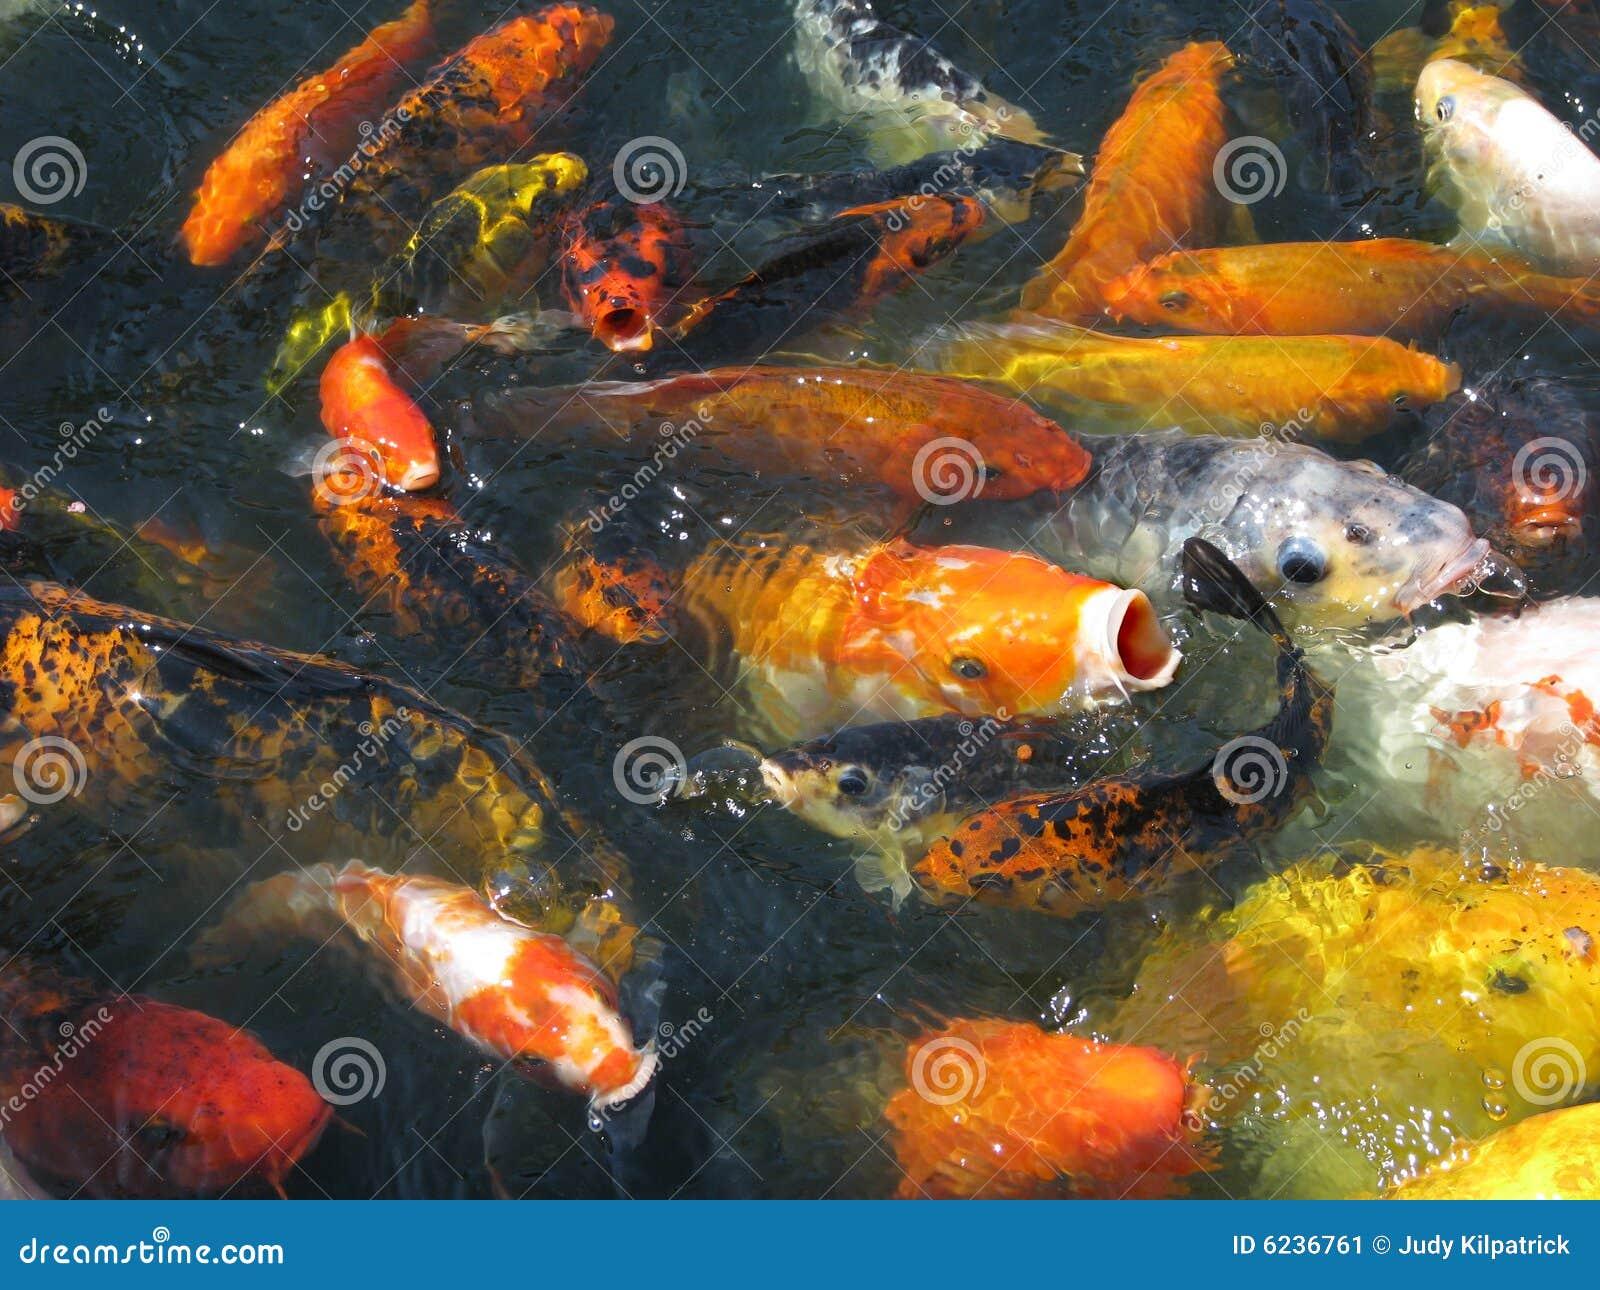 Japanese koi in feeding frenzy stock image image 6236761 for Feeding koi fish